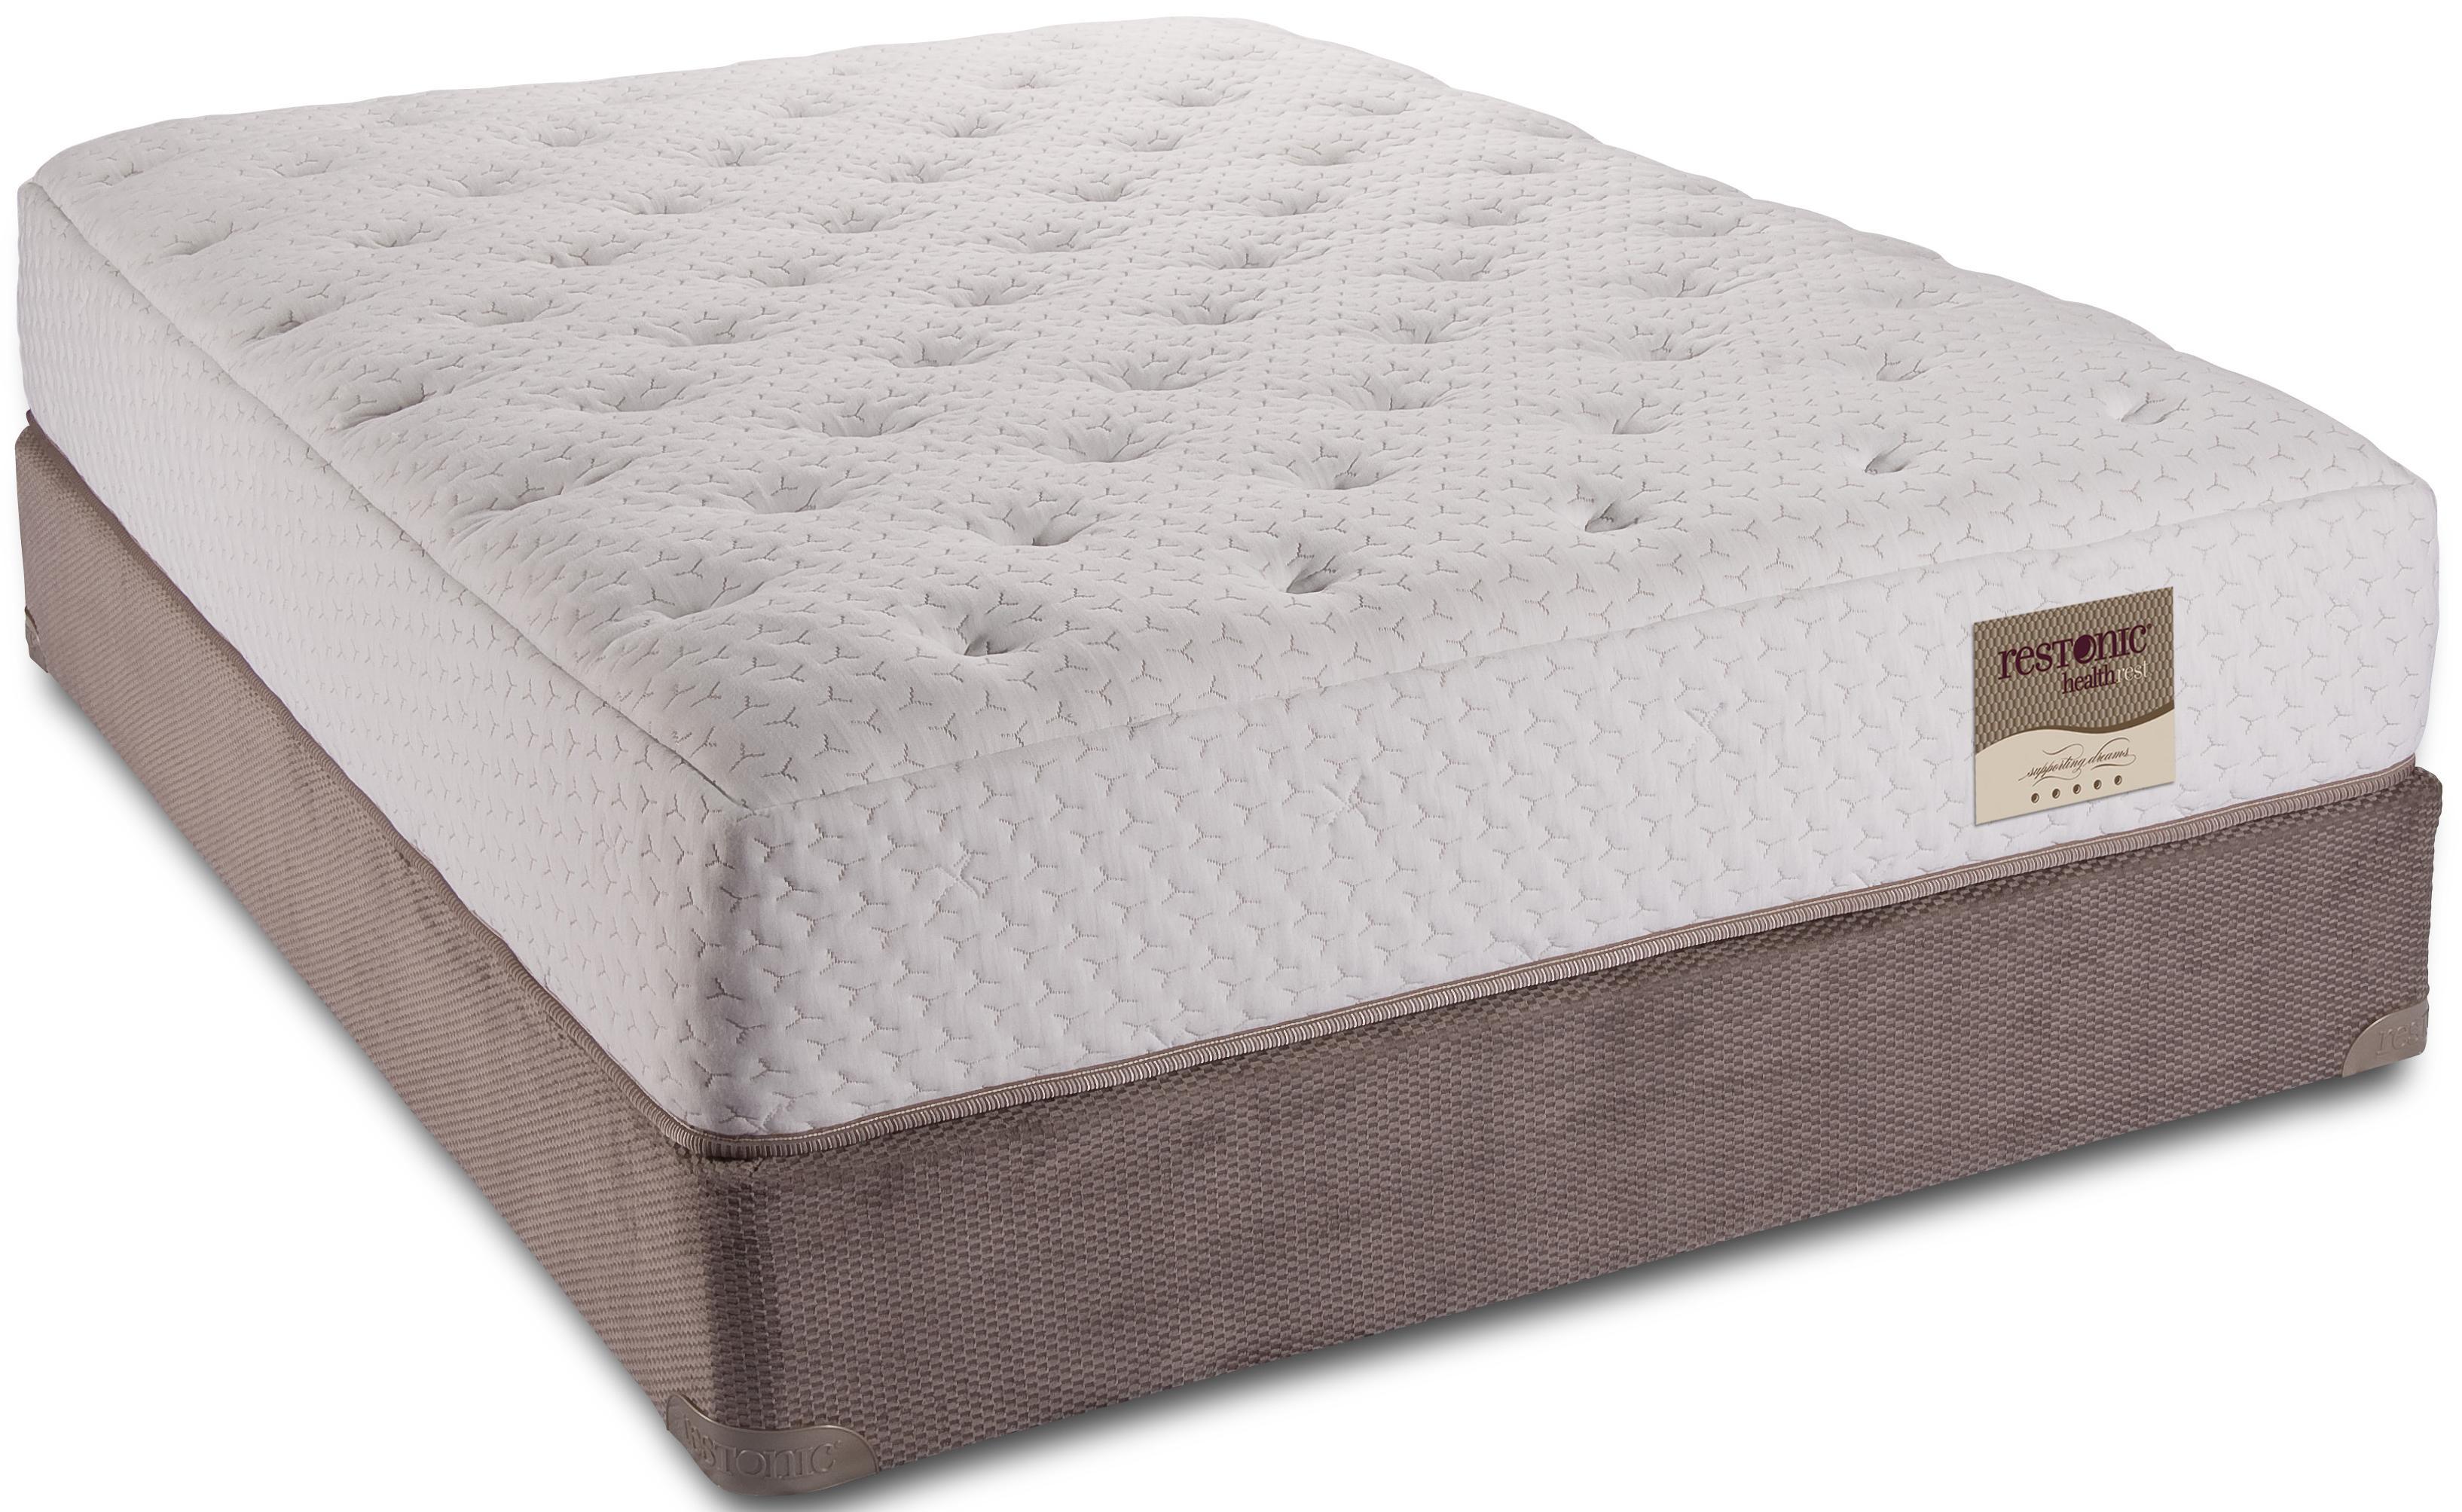 stewart hamilton mattress mattresses reviews goodbed picture restonic com